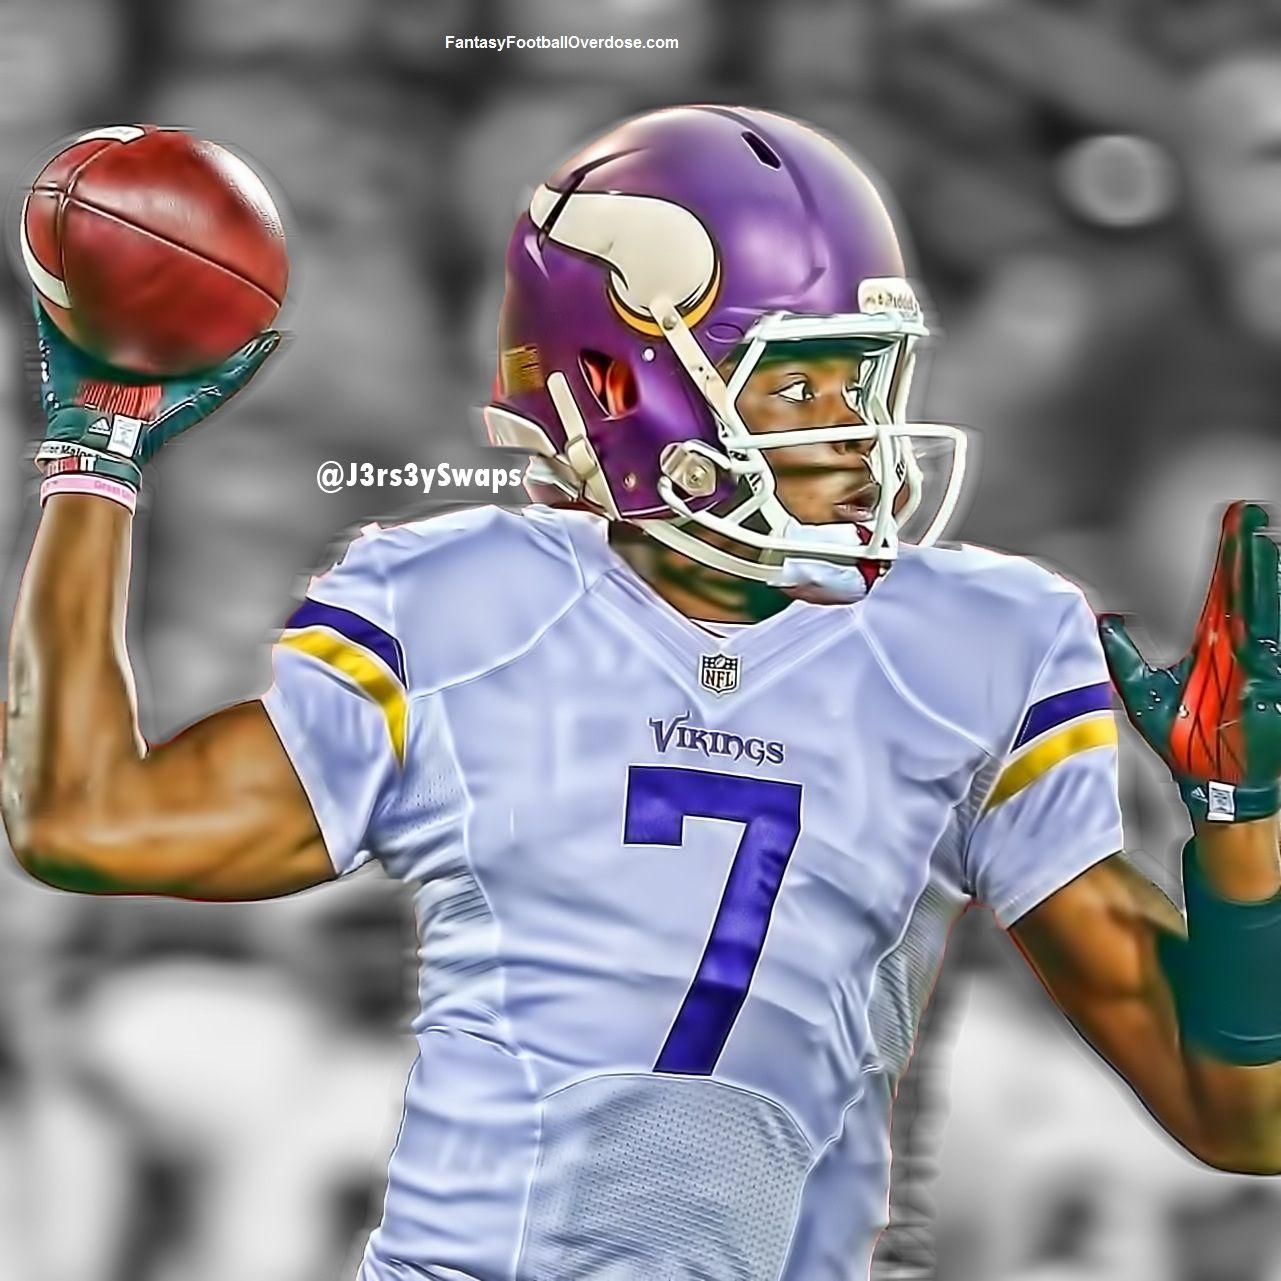 Wholesale NFL Jersey Swaps: Teddy Bridgewater with the Minnesota Vikings  hot sale